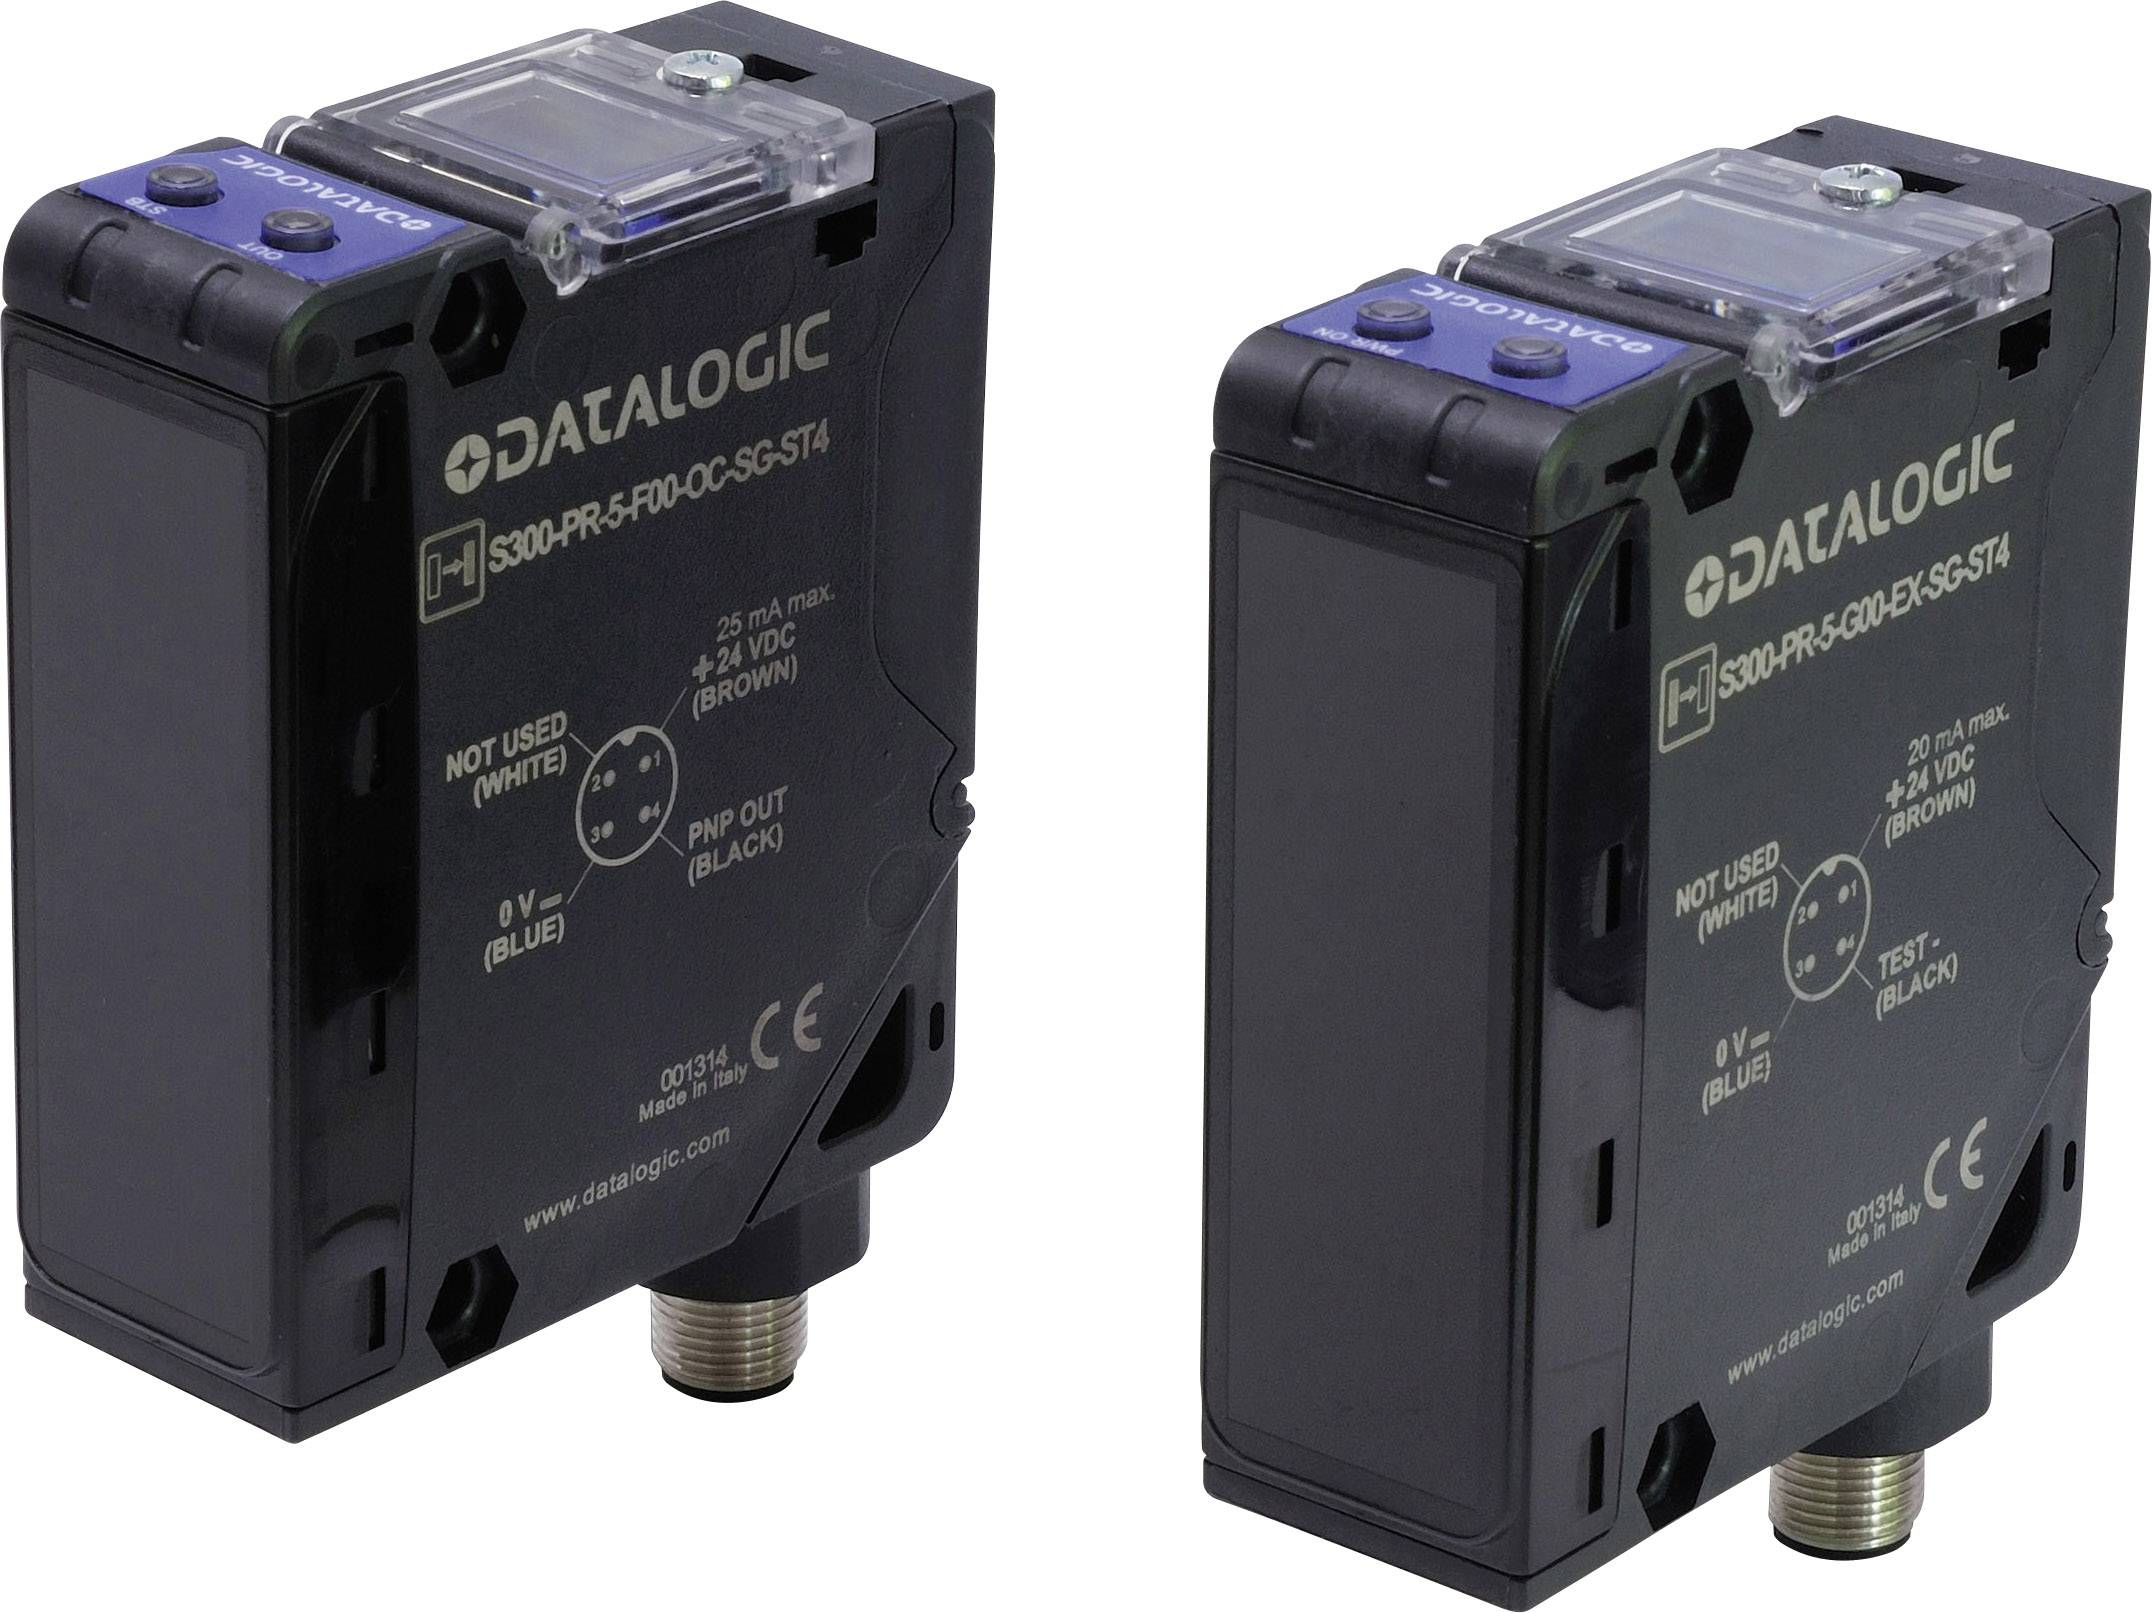 Reflexná svetelná závora DataLogic S300-PR-1-B06-RX-M 951451060, max. dosah 22 m